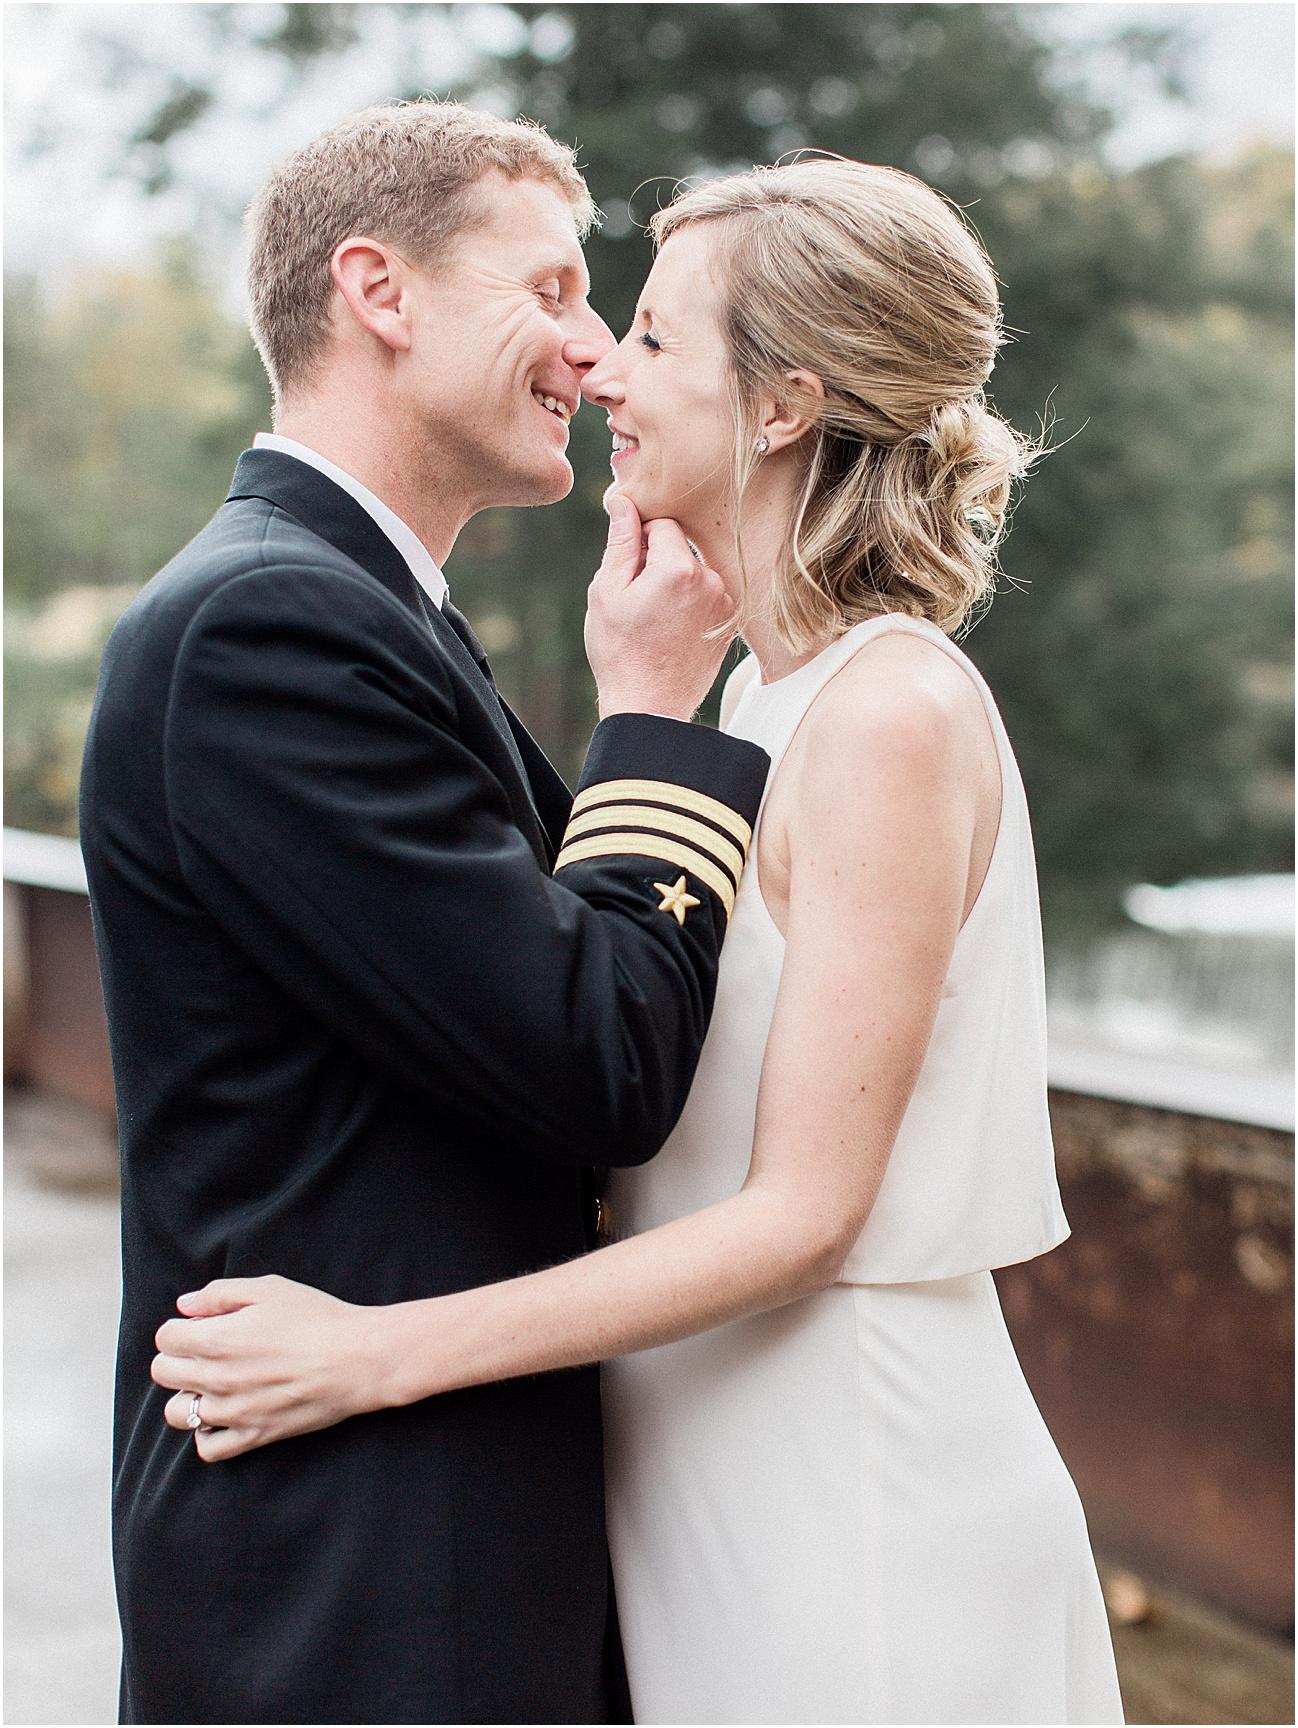 lauren_john_jon_ablany_browns_brewery_moses_farm_fall_cape_cod_boston_wedding_photographer_meredith_jane_photography_photo_1517.jpg